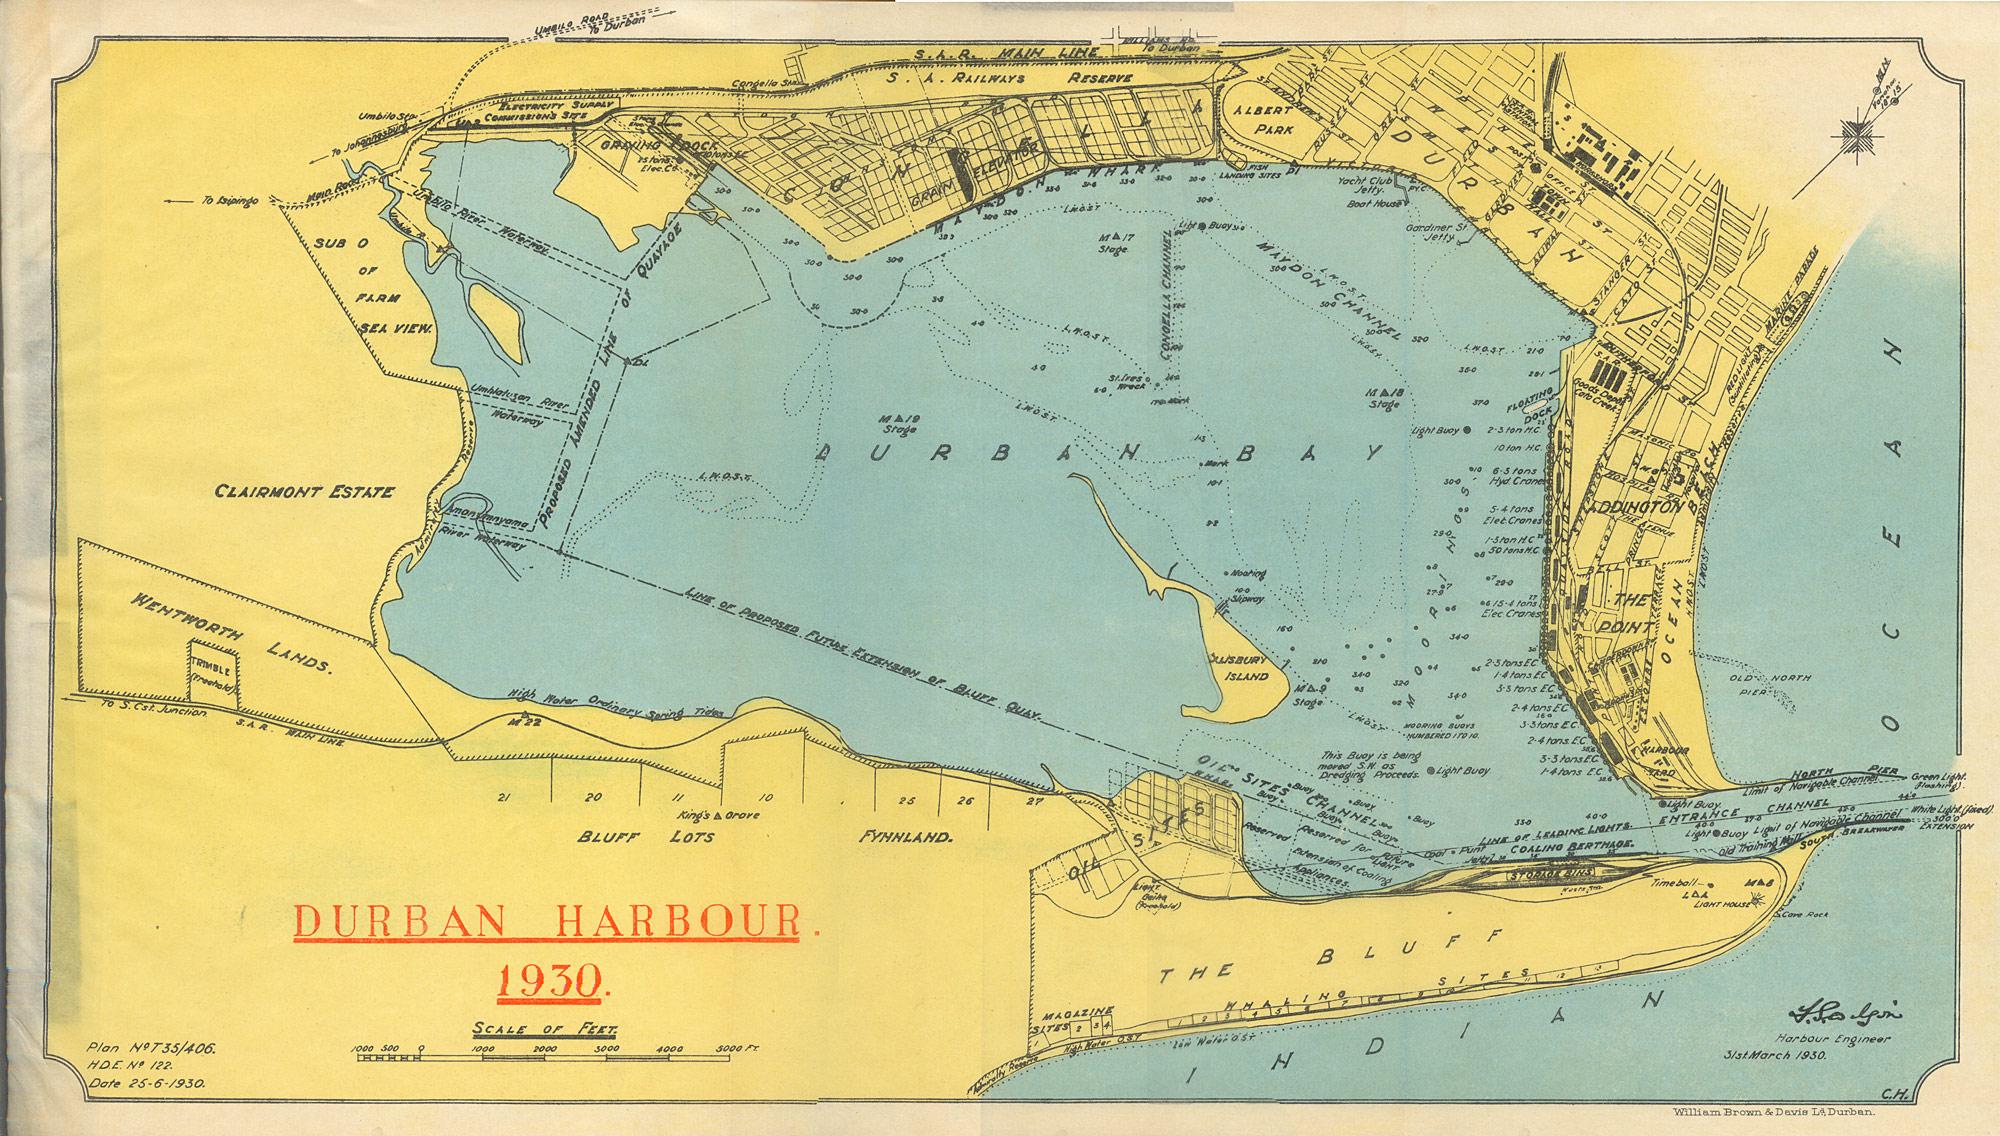 fad bay map